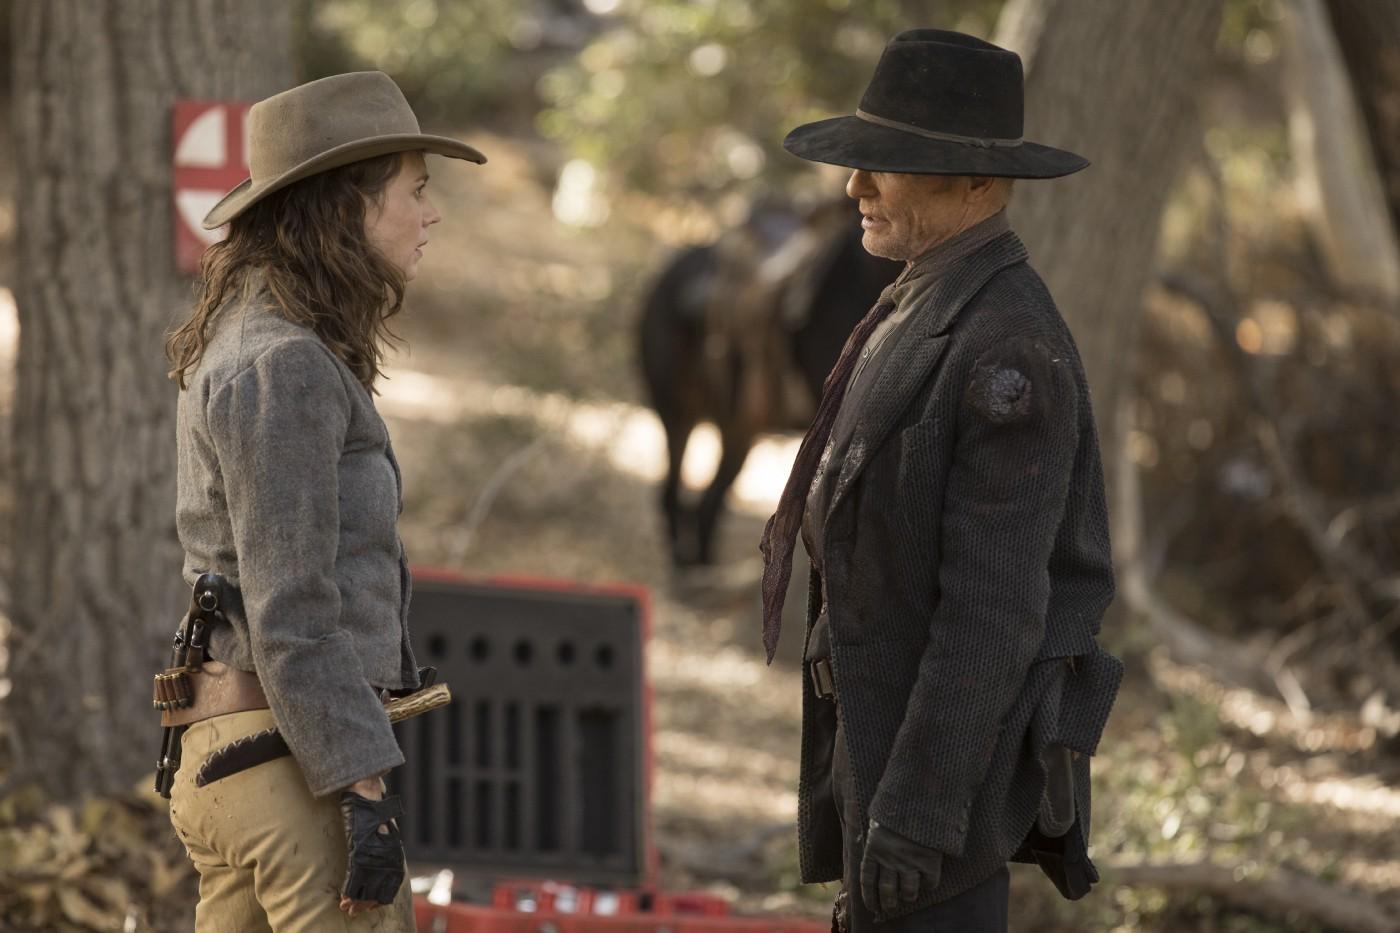 Westworld: Katja Herbers insiema a Ed Harris in una scena dell'episodio Vanishing Point